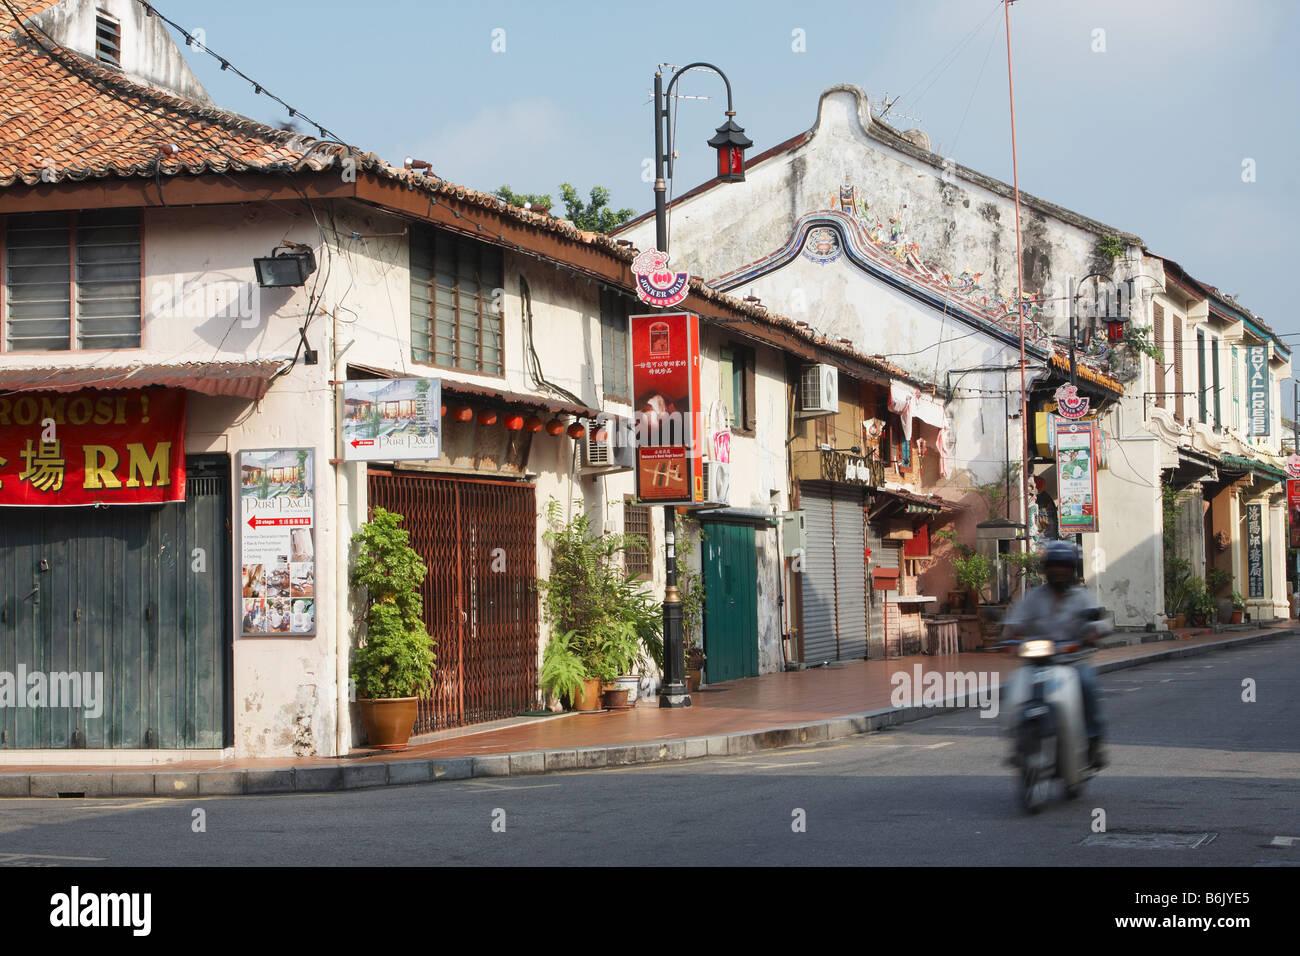 Motorcyclist Riding Along Street In Chinatown, Melaka Stock Photo